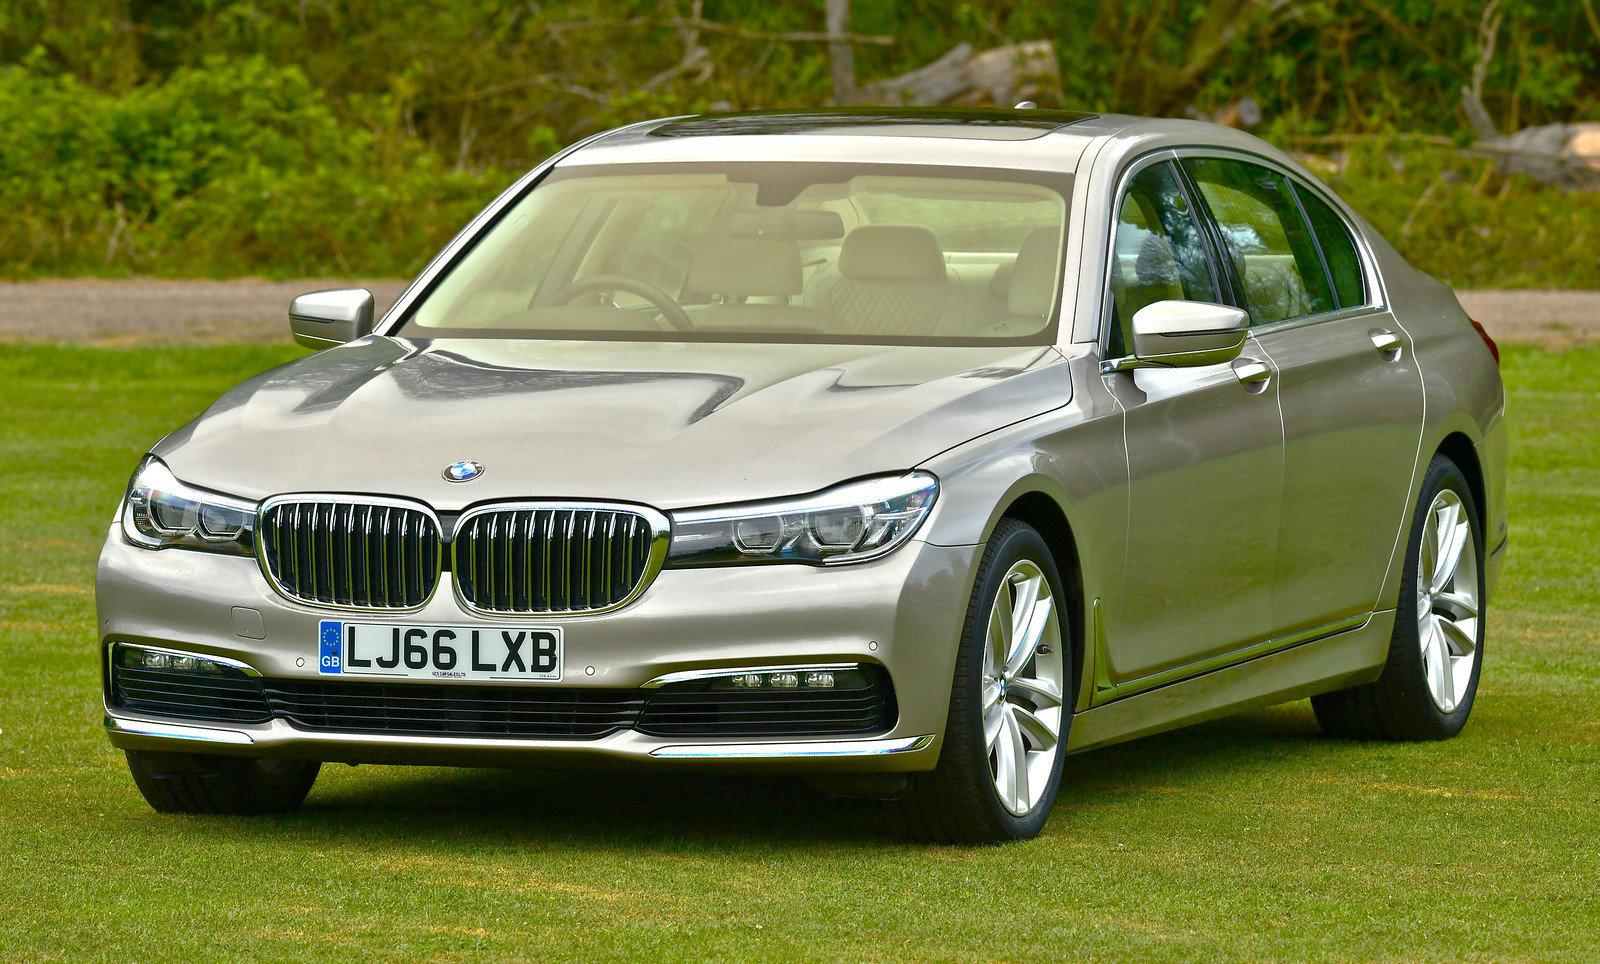 2016 BMW 7 Series Twin Turbo  740Li LWB Saloon 4dr Petrol  SOLD (picture 1 of 6)